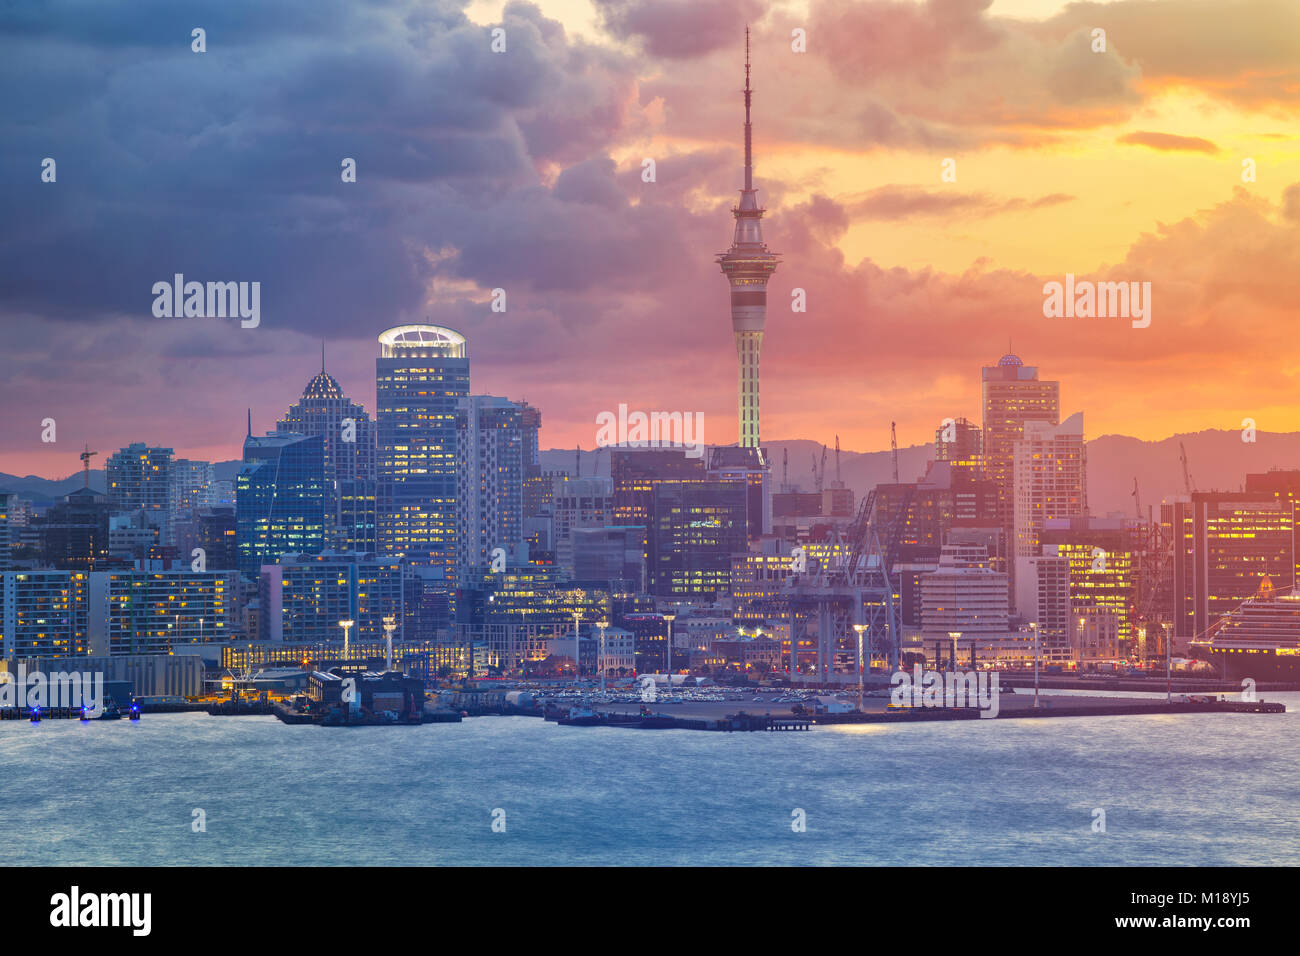 Auckland. Paisaje urbano imagen de skyline de Auckland, Nueva Zelanda durante el atardecer. Imagen De Stock